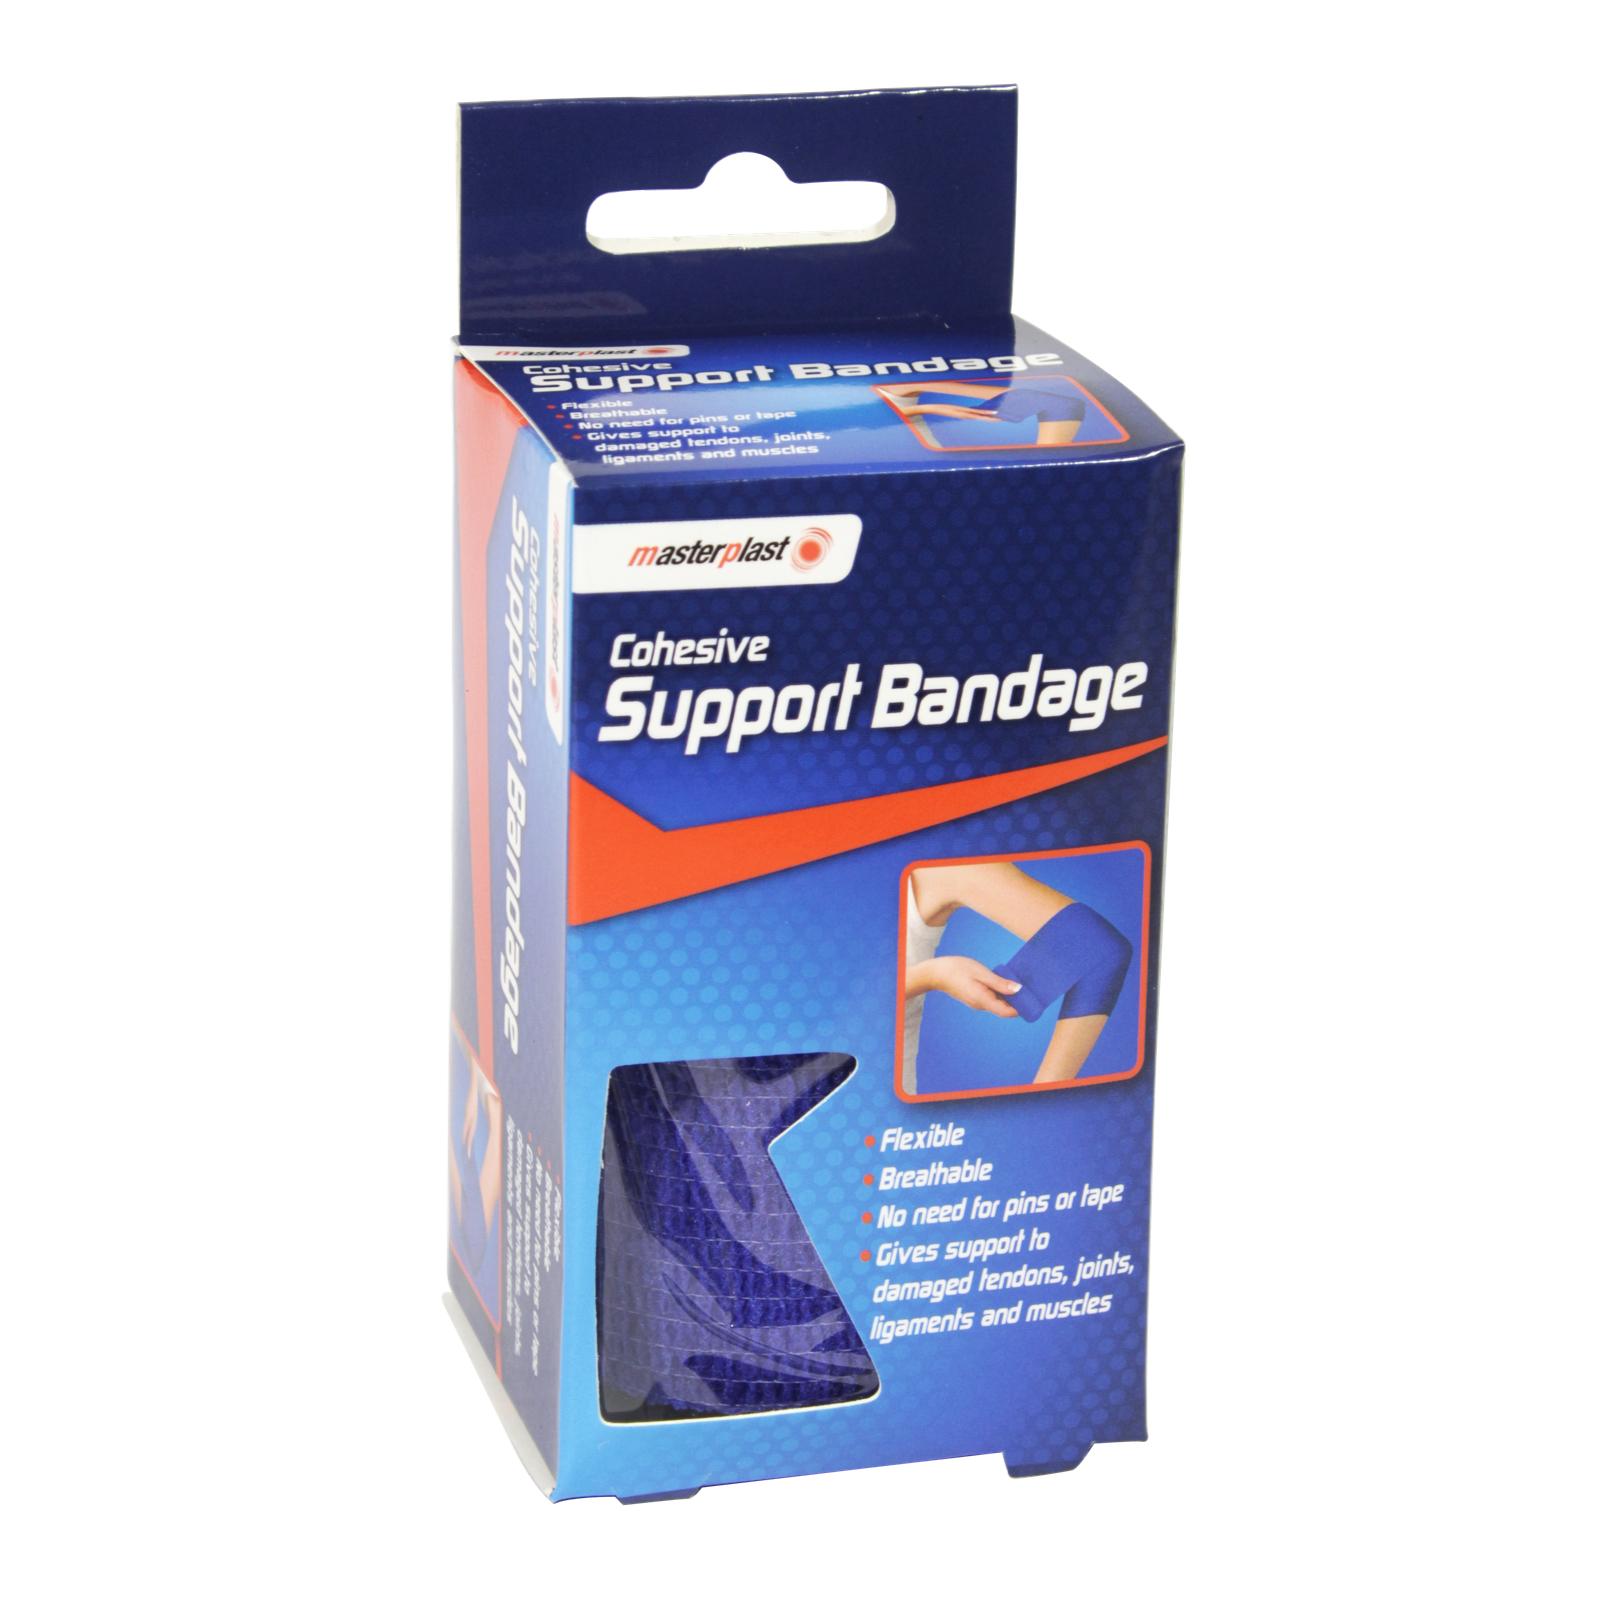 MASTER PLASTER COHESIVE SUPP BANDAGE 7CM X 4YRDS